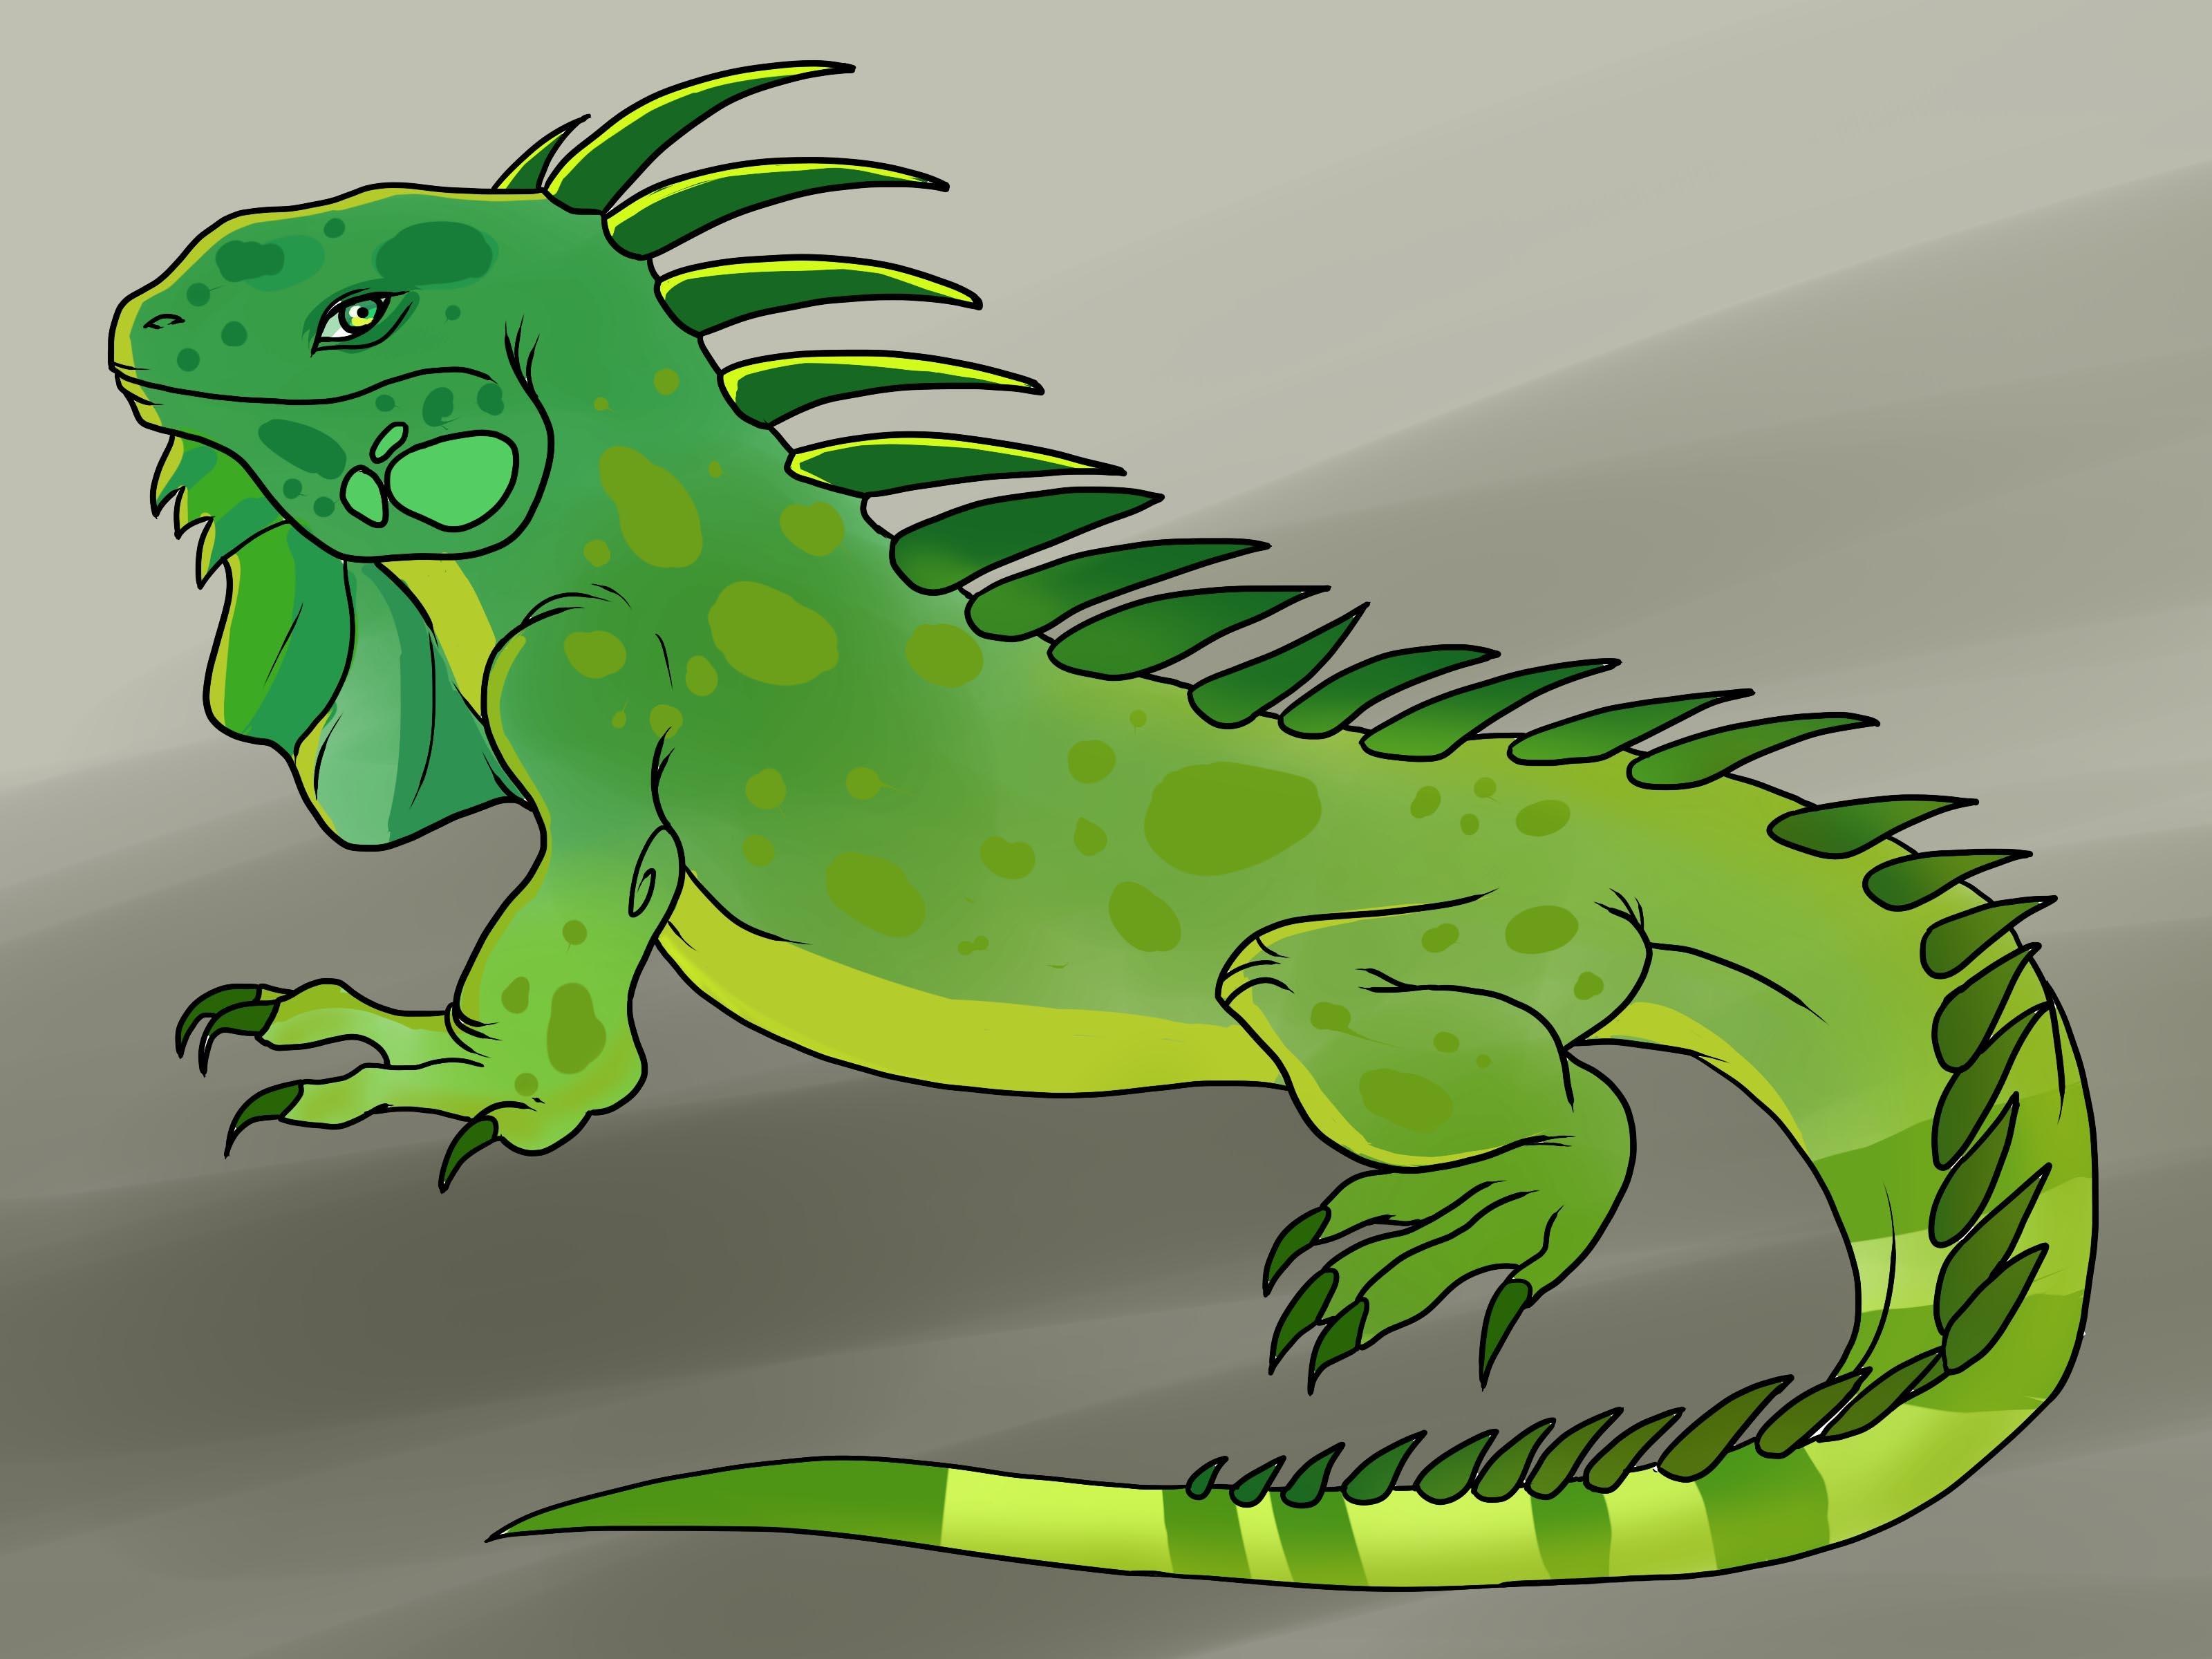 Drawn reptile iguana Iguana How wikiHow to an